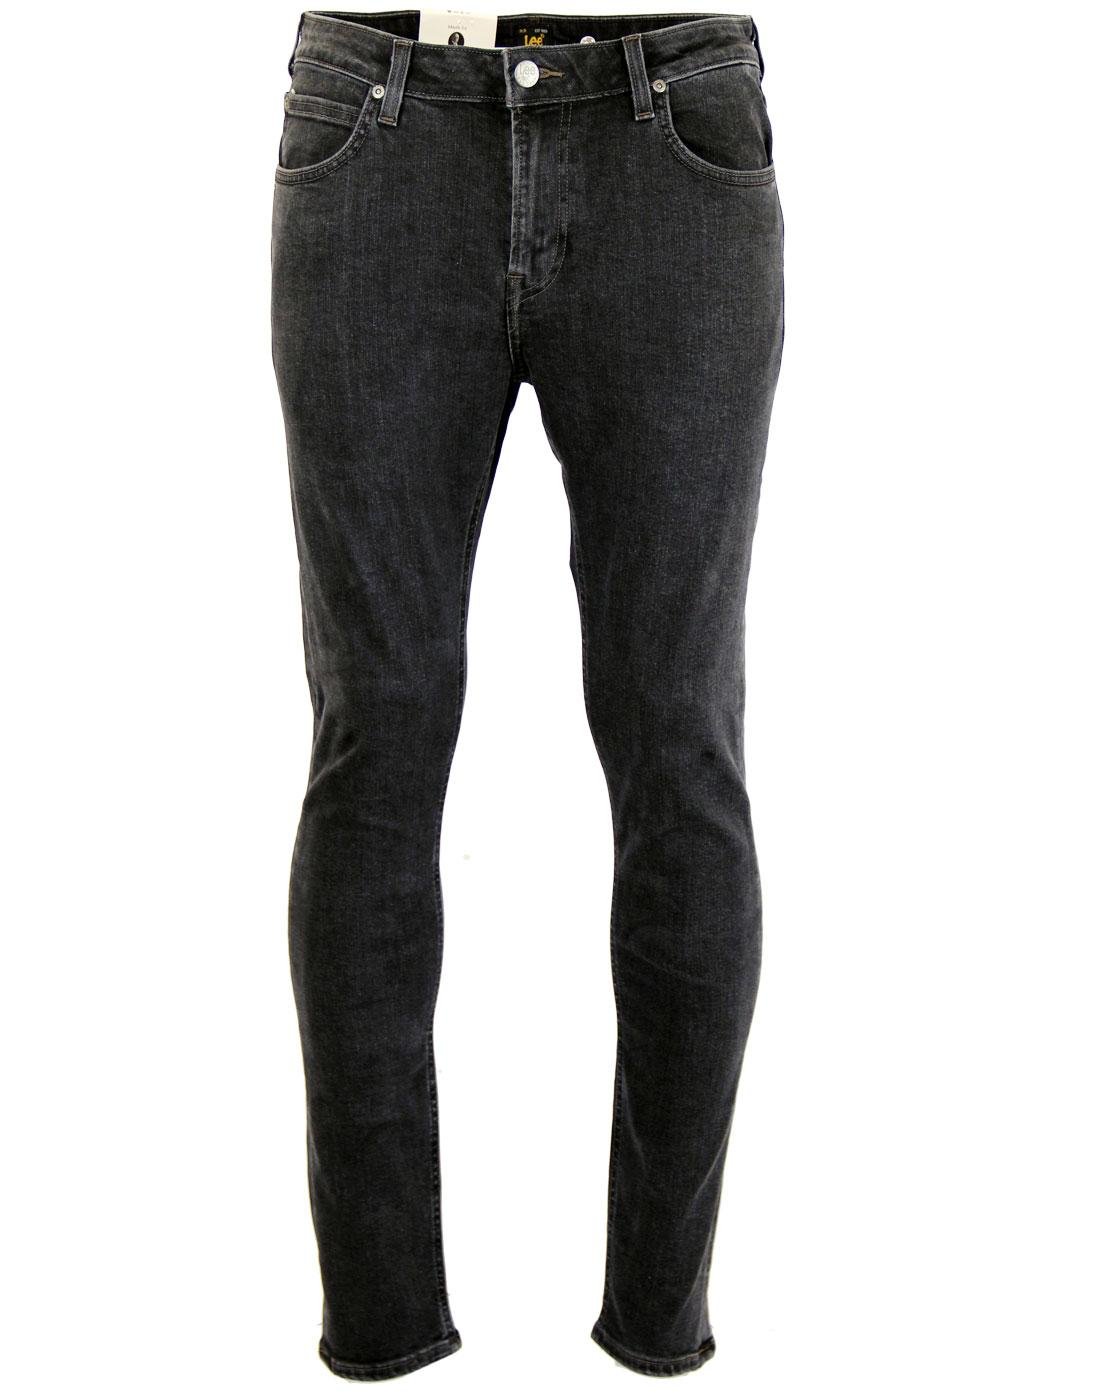 52f945c0 LEE Malone Retro Indie Mod Skinny Drainpipe Jeans in Black Wash